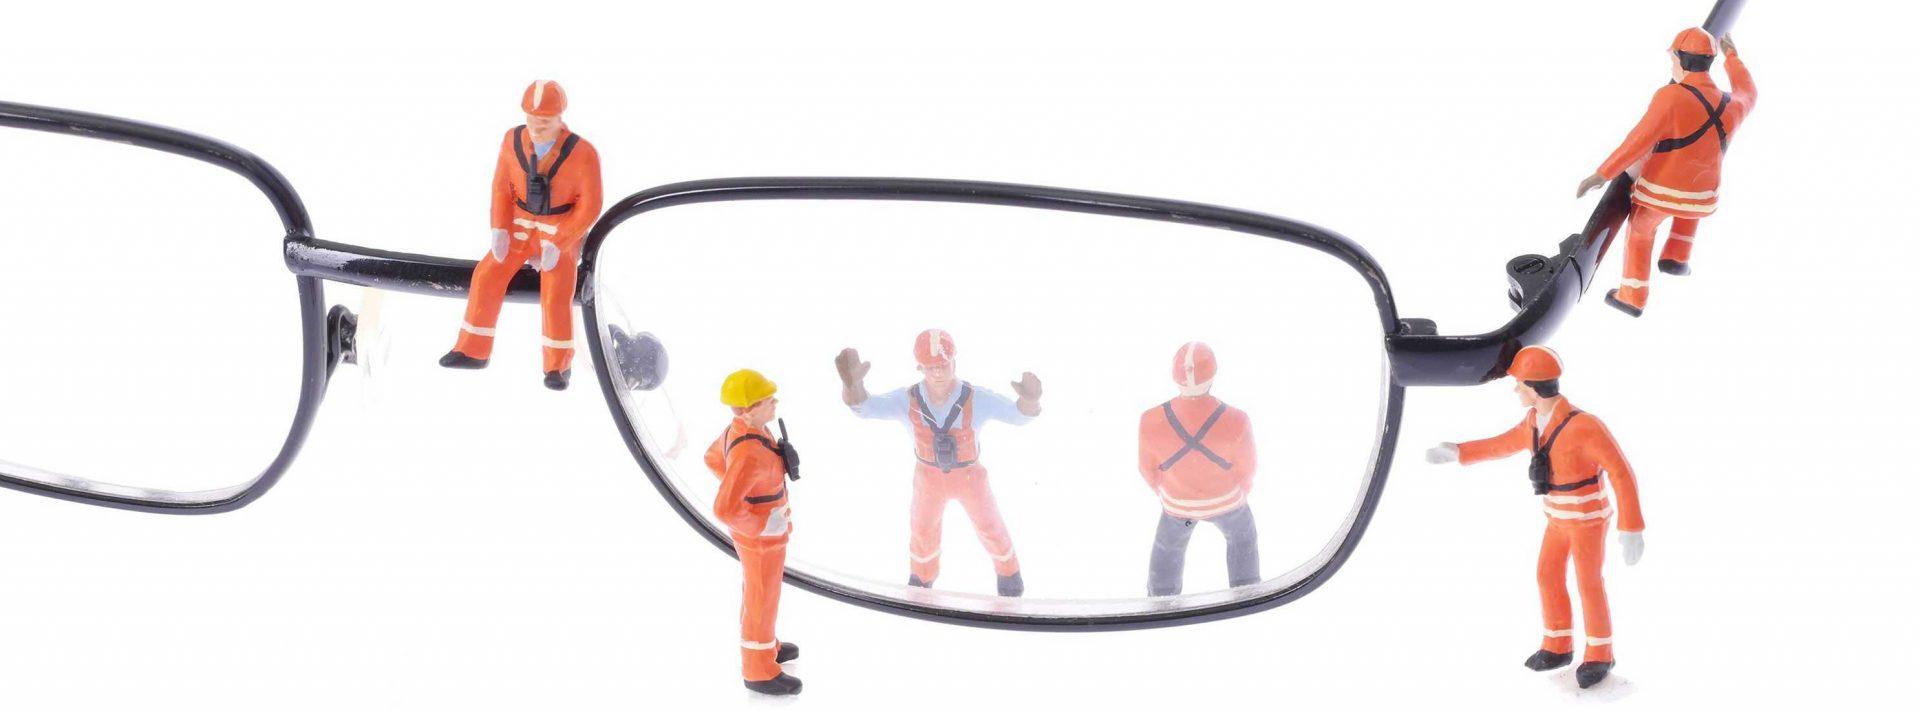 Services Spectacles Repair